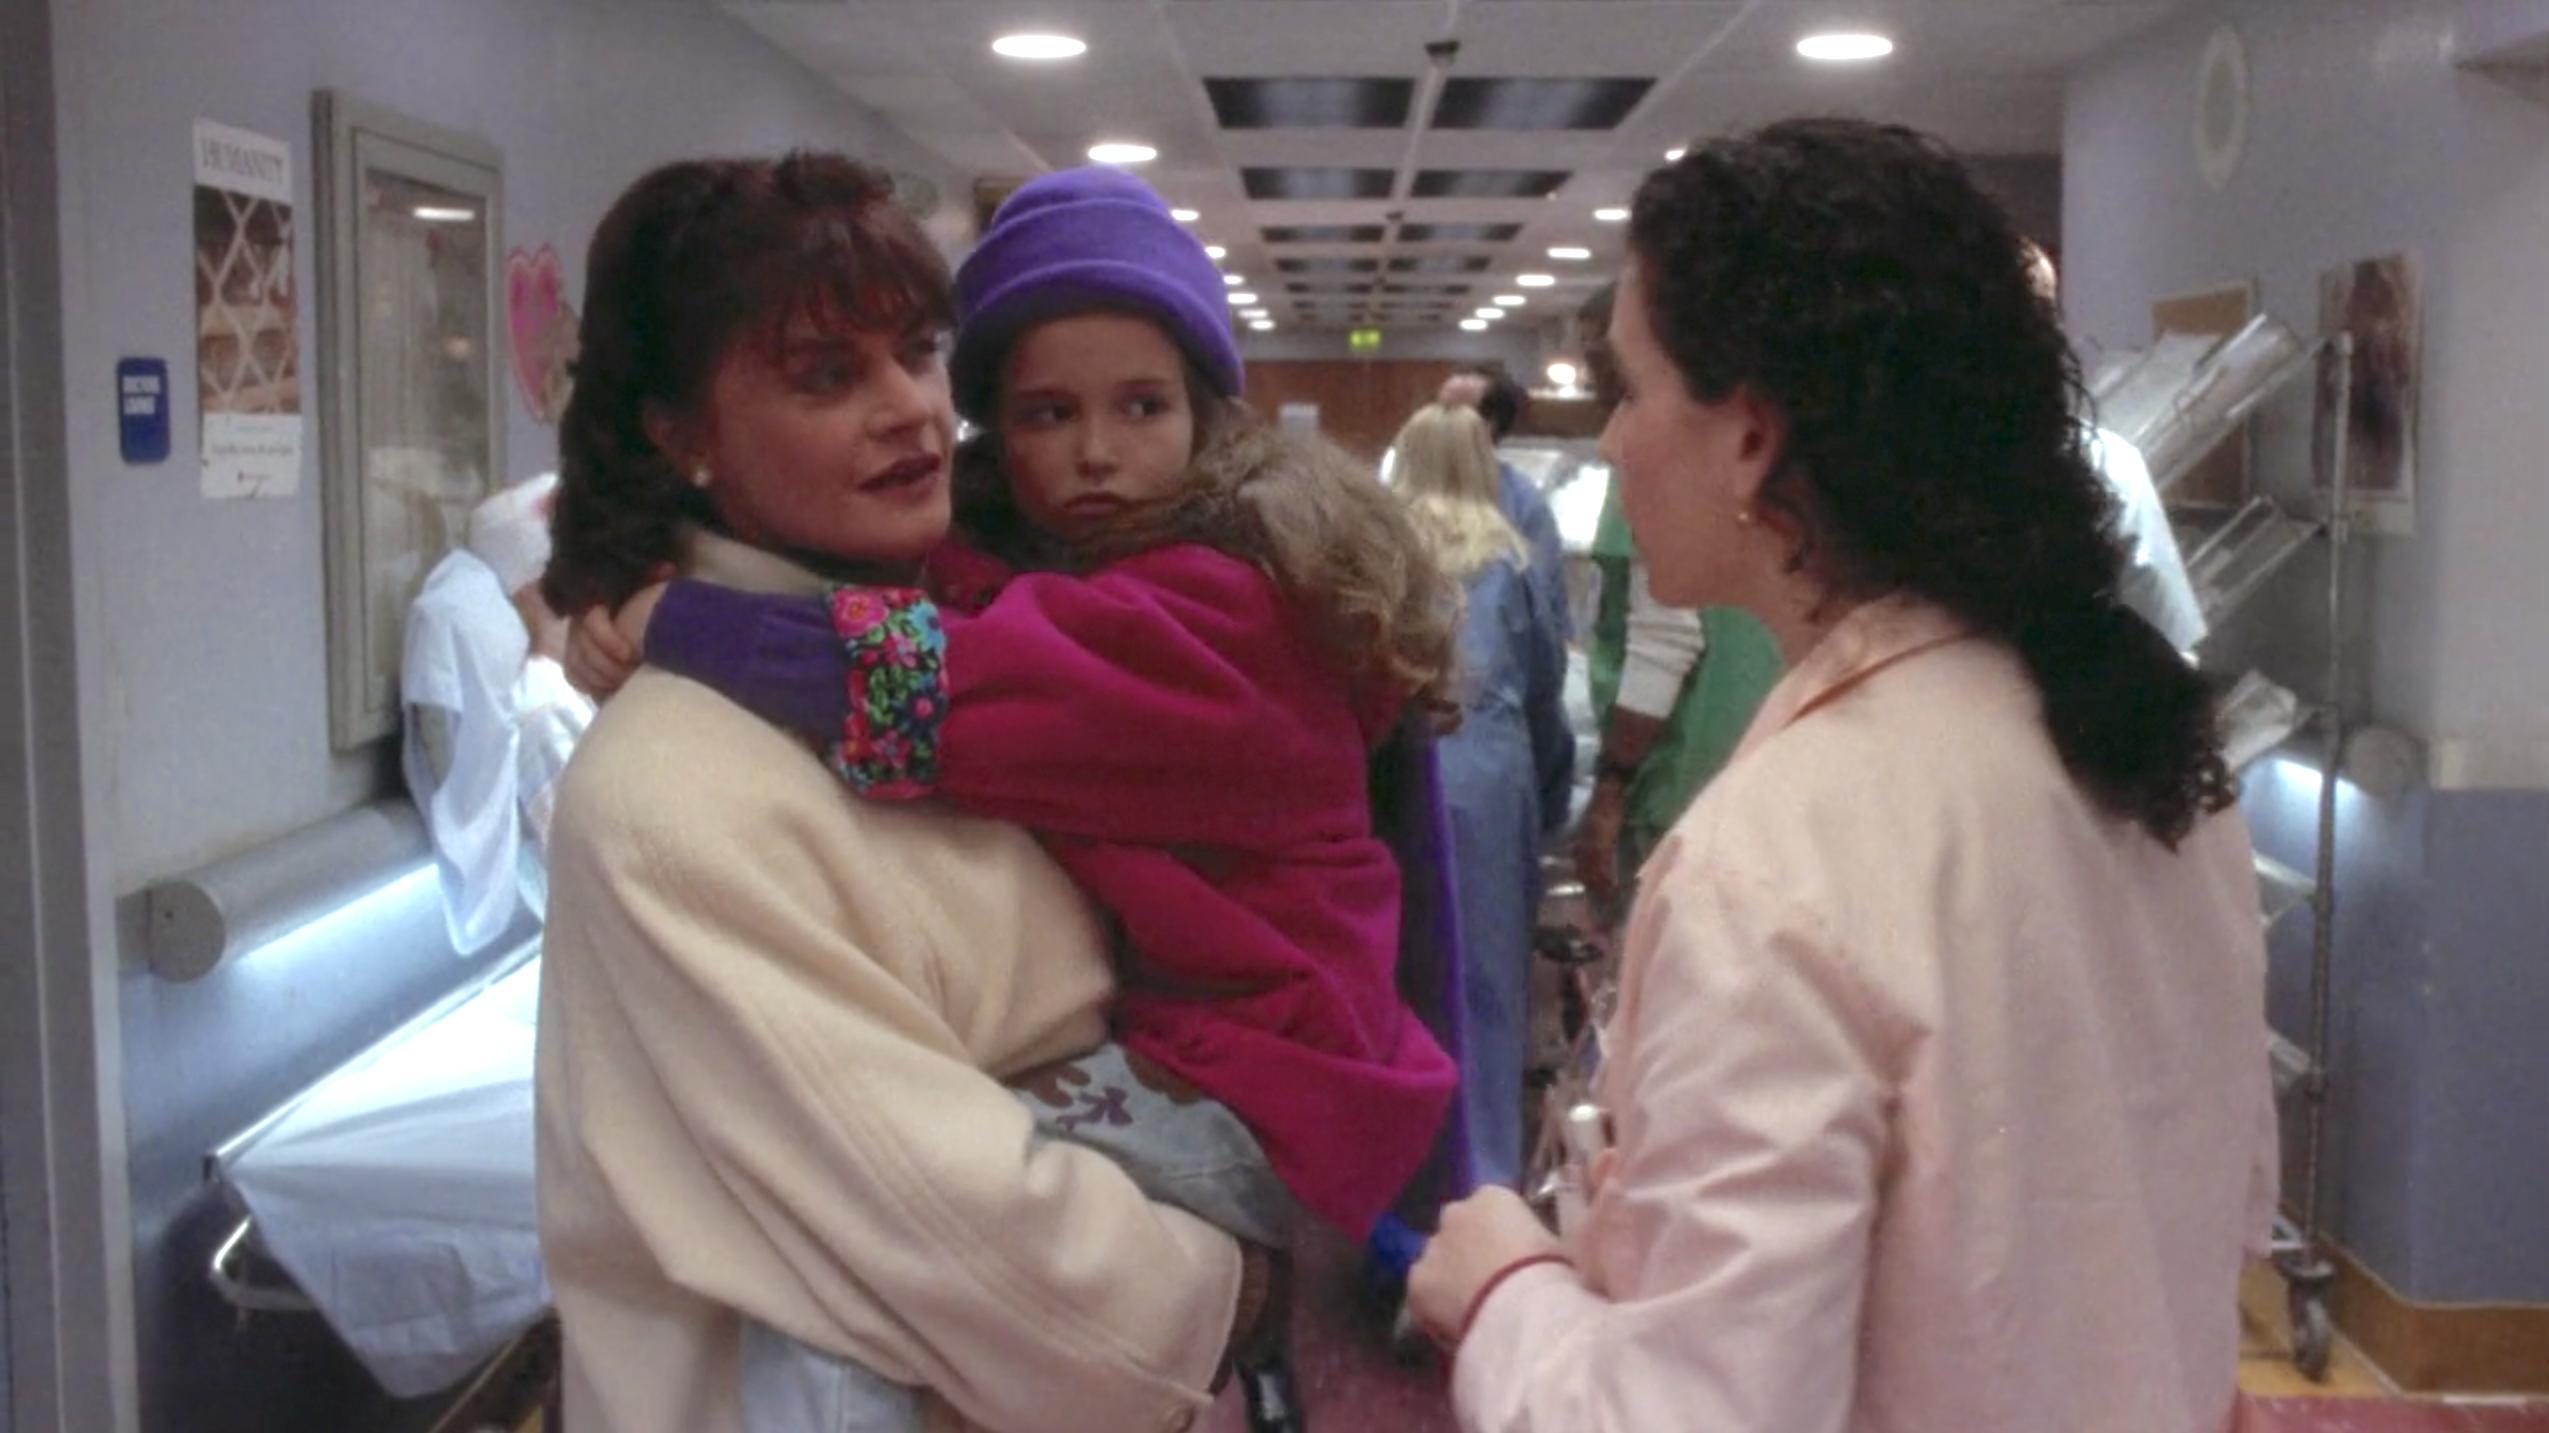 Julianna Margulies, Meg Foster, and Milana Vayntrub in ER (1994)